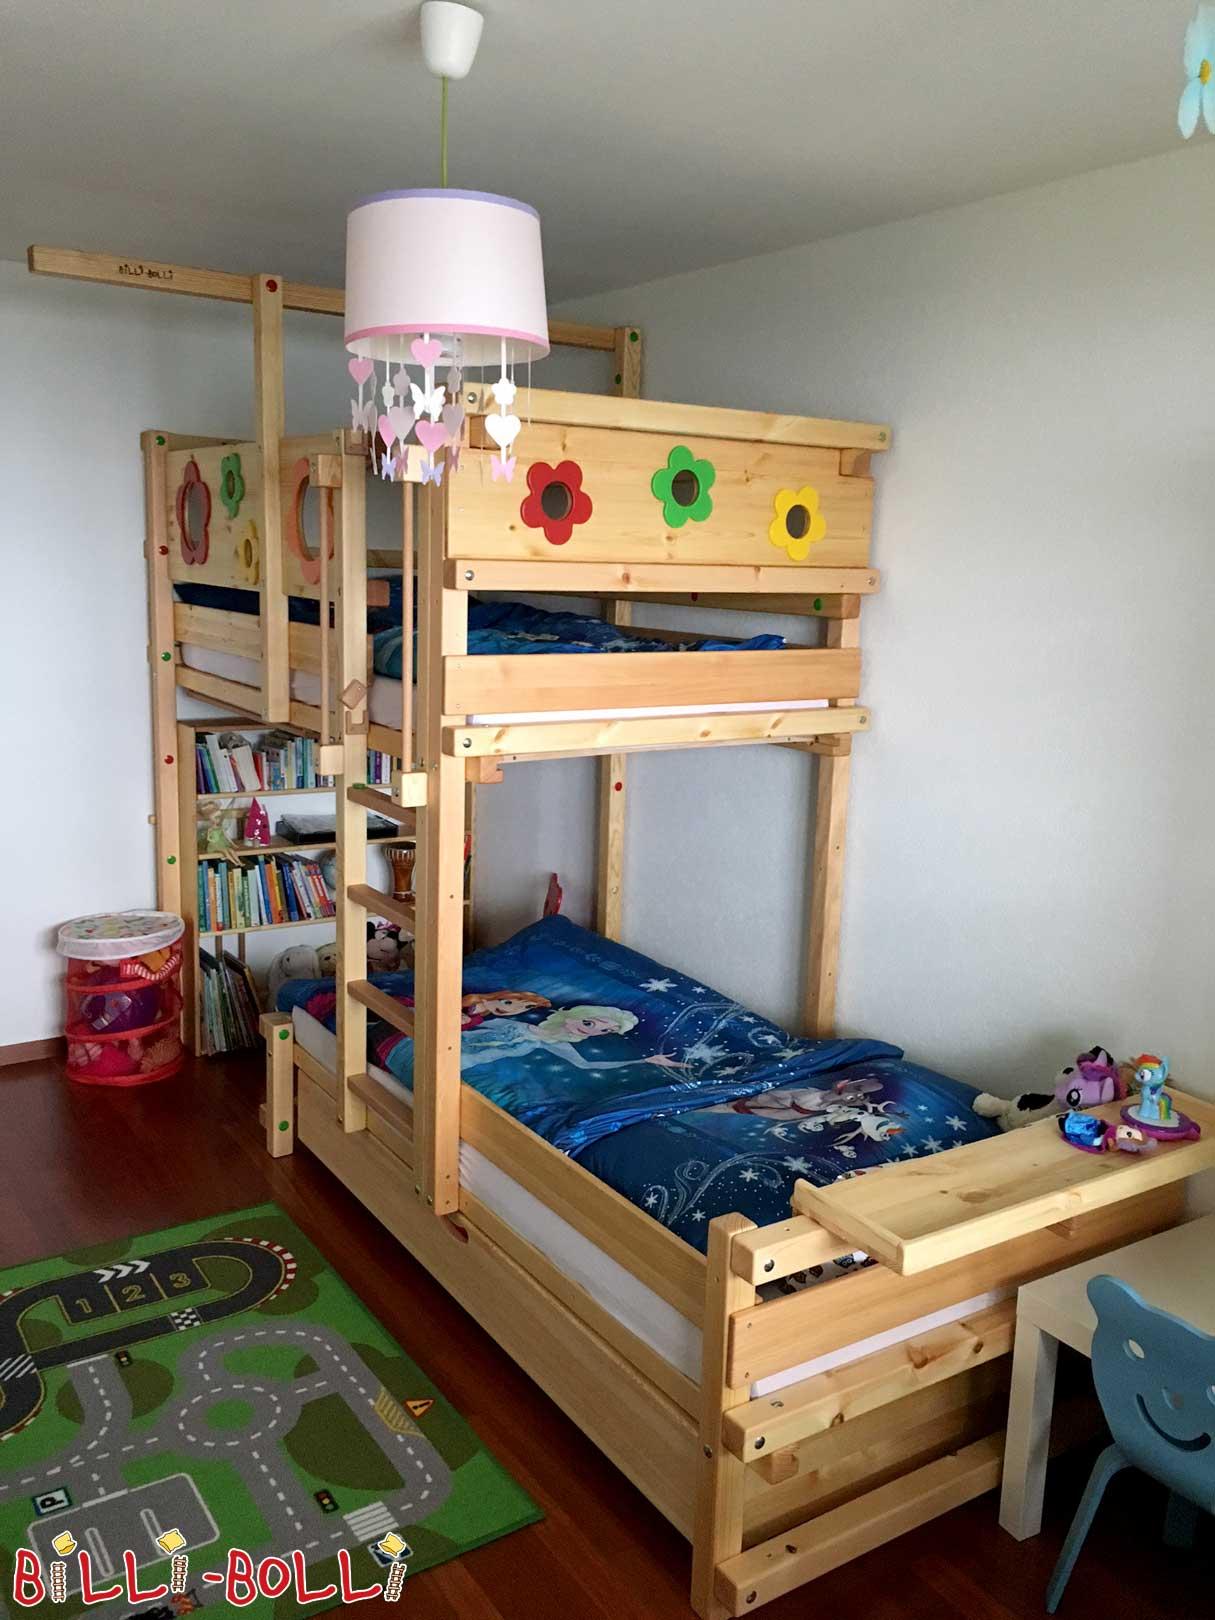 Billi Bolli bunk bed laterally staggered billi bolli furniture